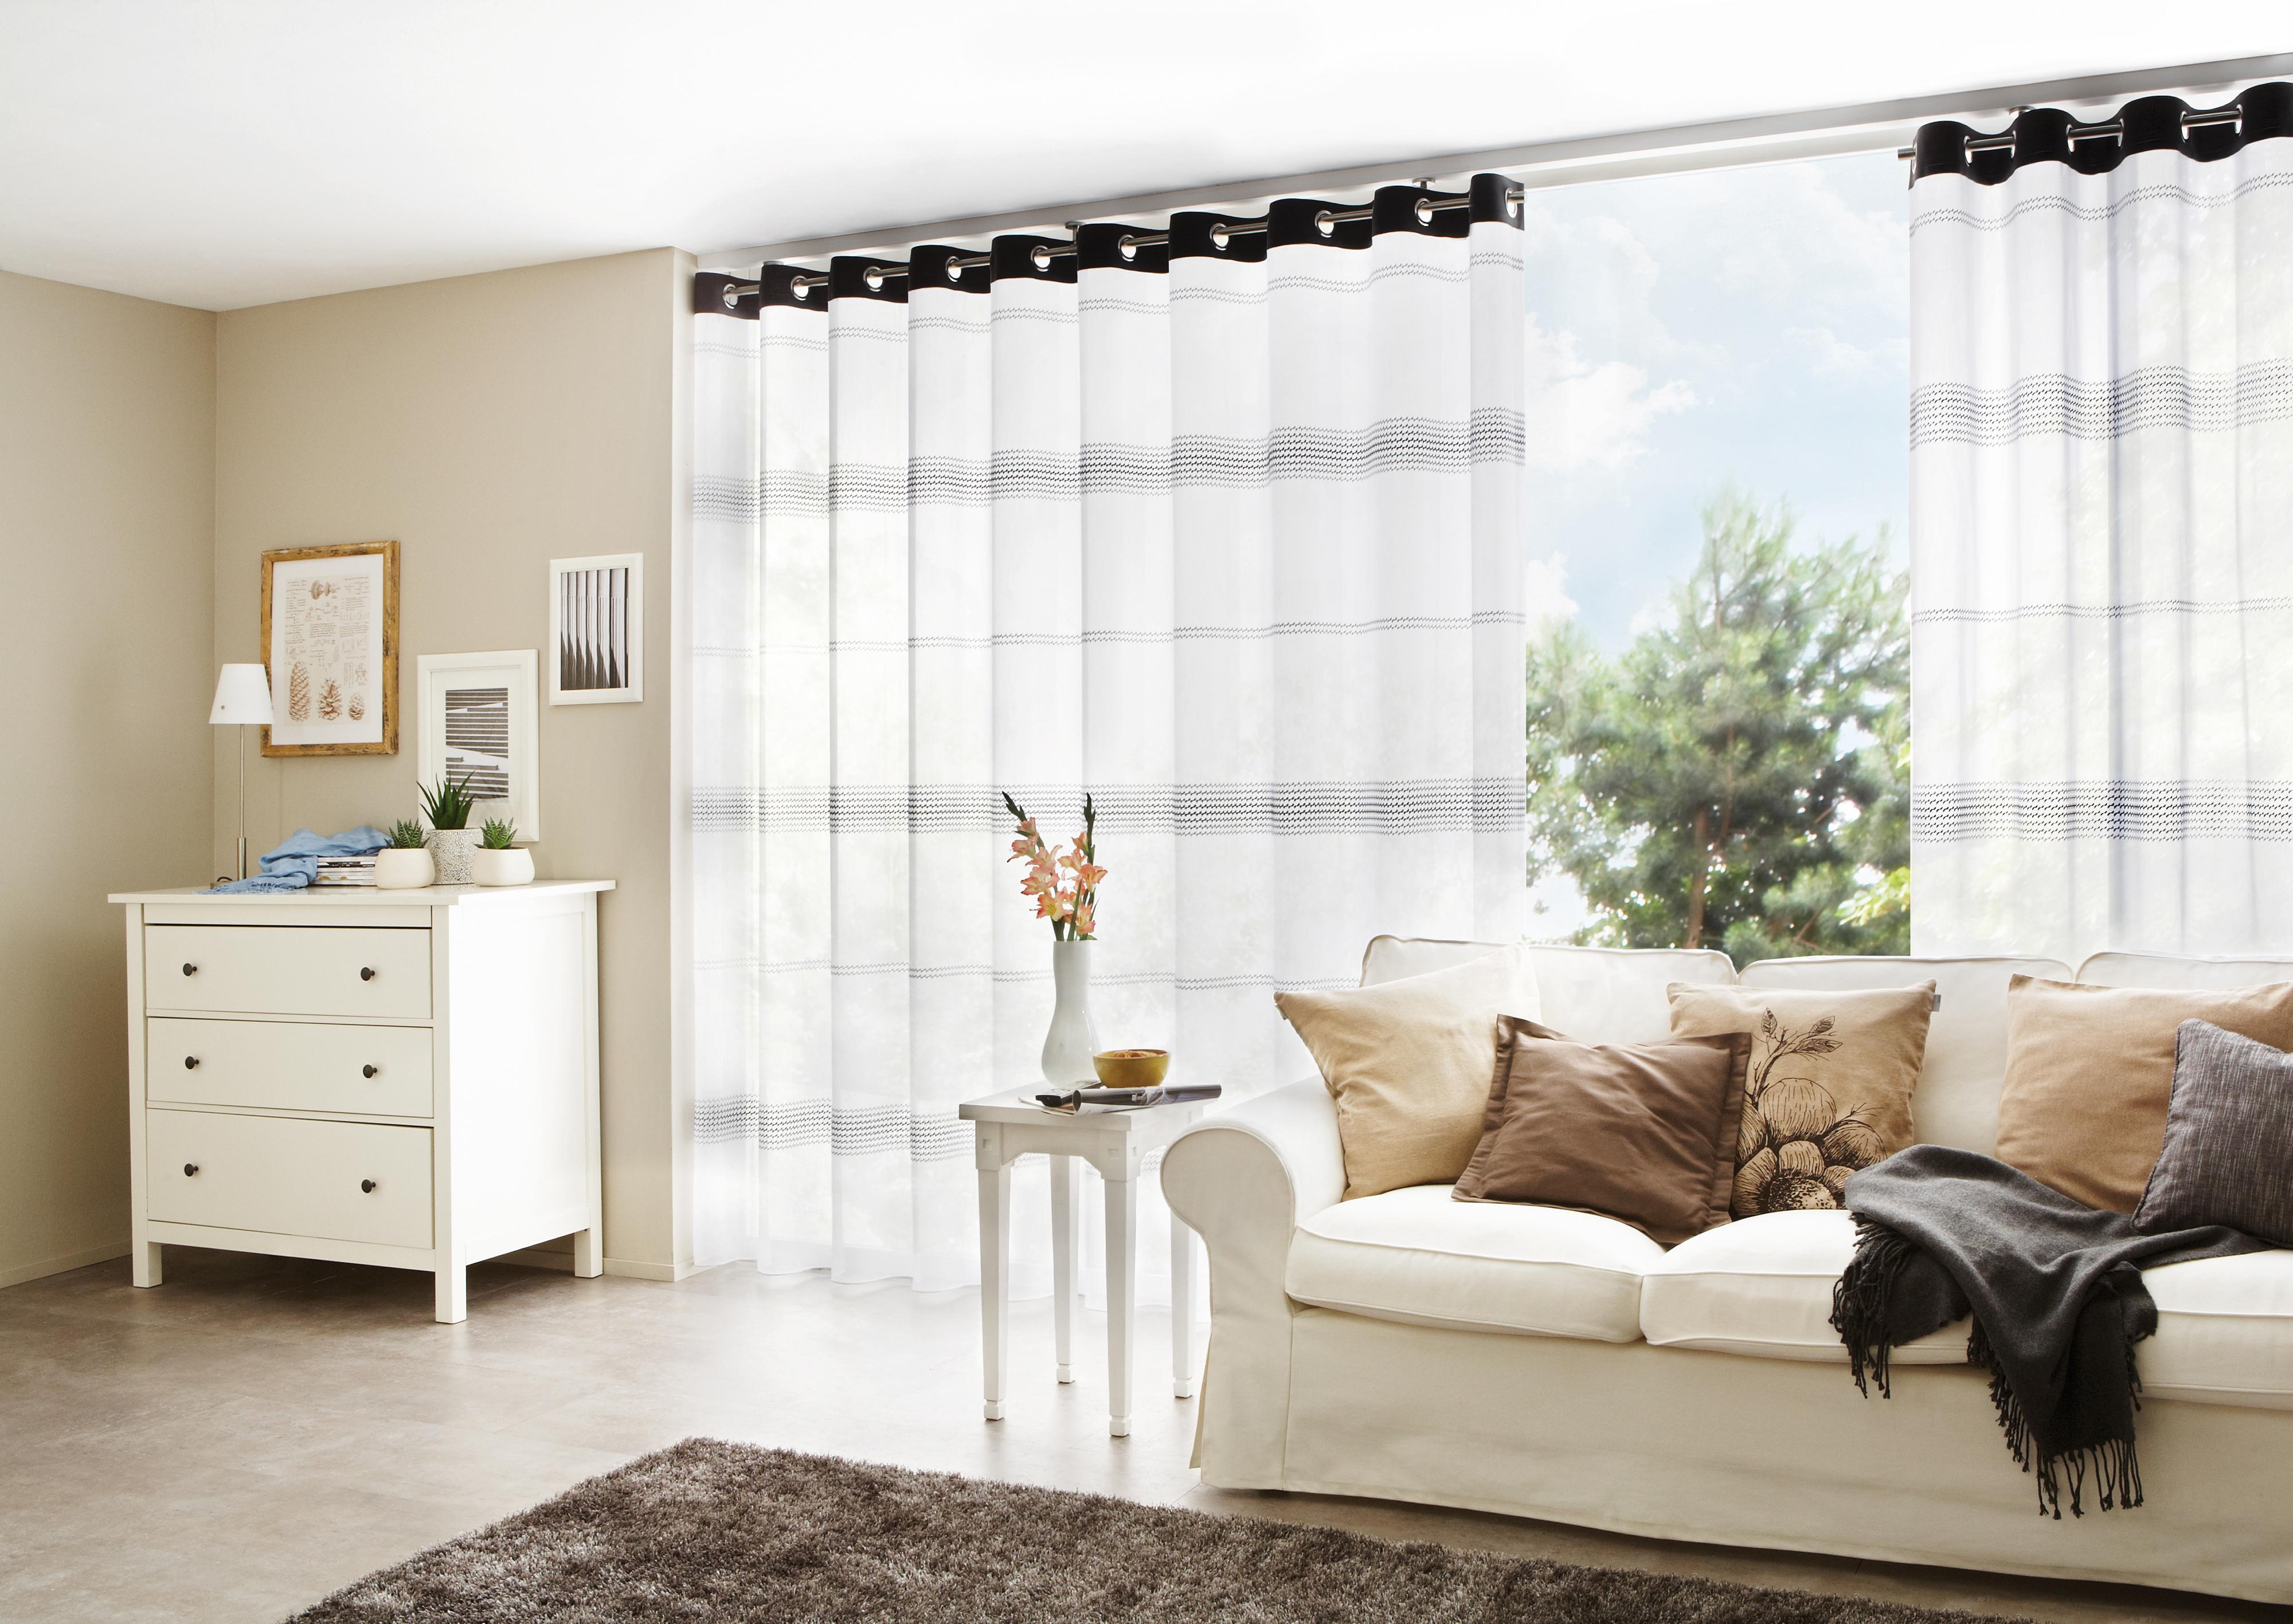 gardinen f r grosse terrassenfenster hcvc. Black Bedroom Furniture Sets. Home Design Ideas